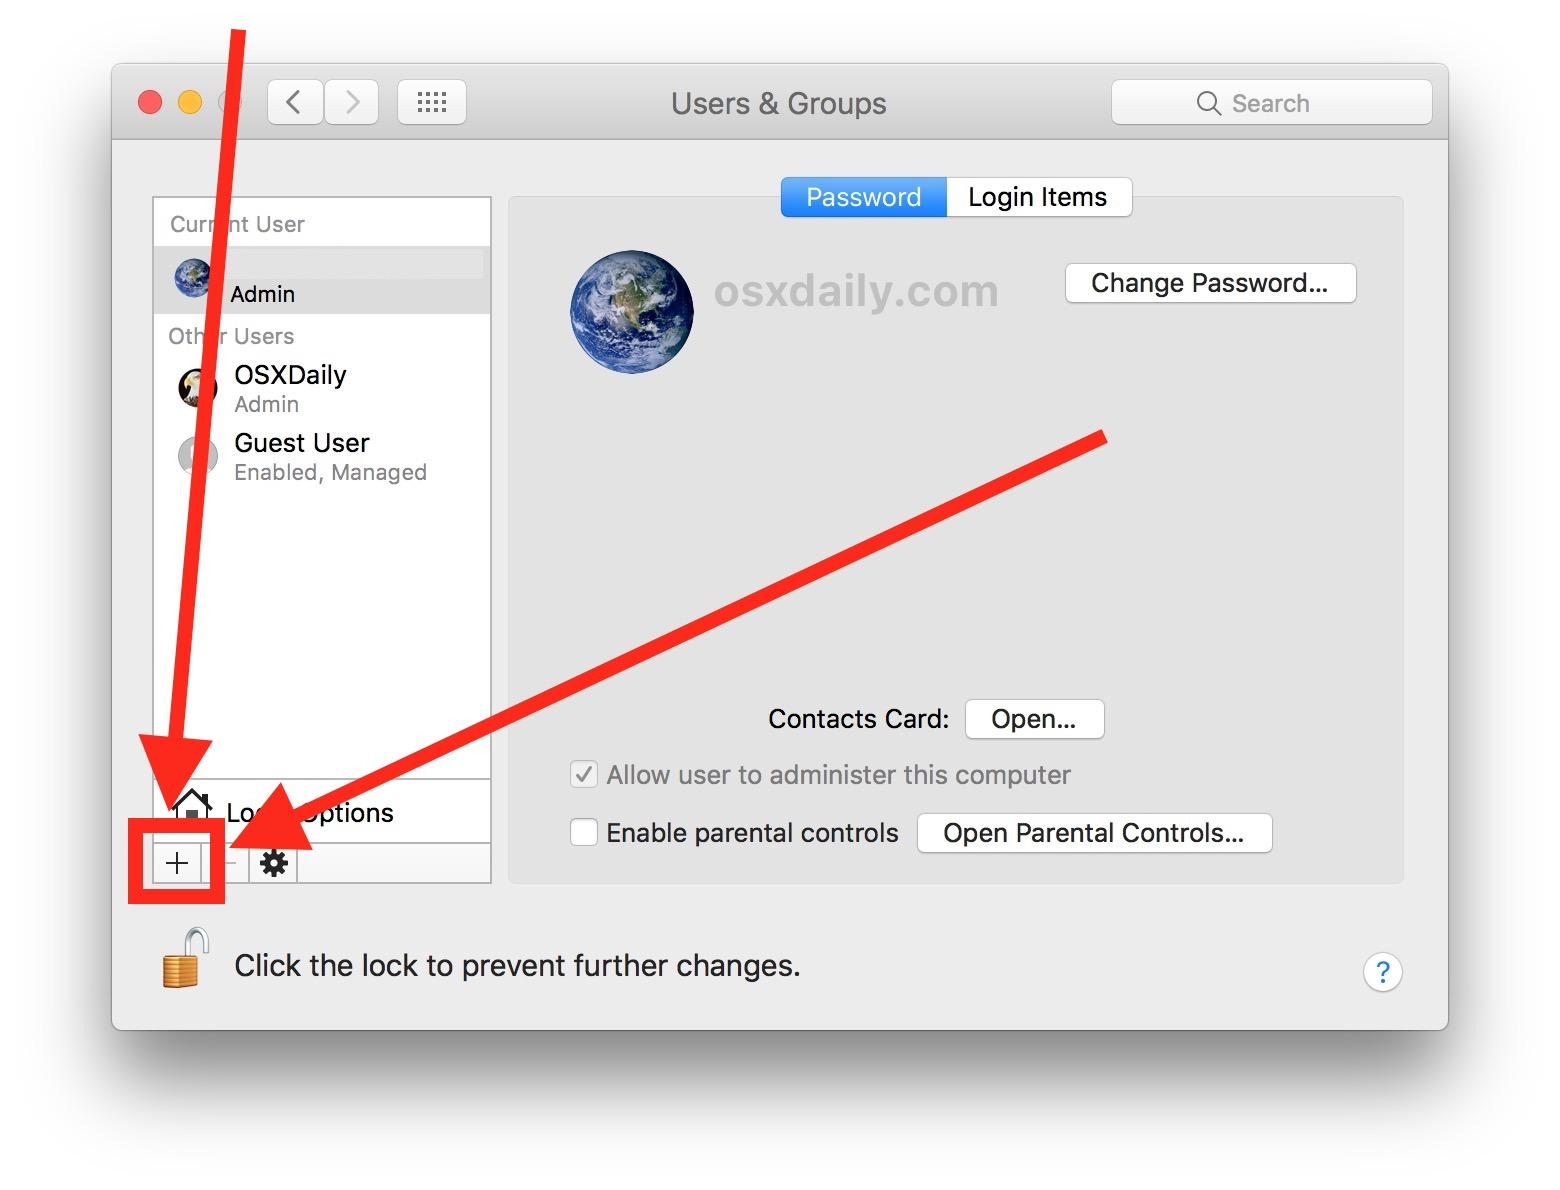 Create a new admin user account on the Mac